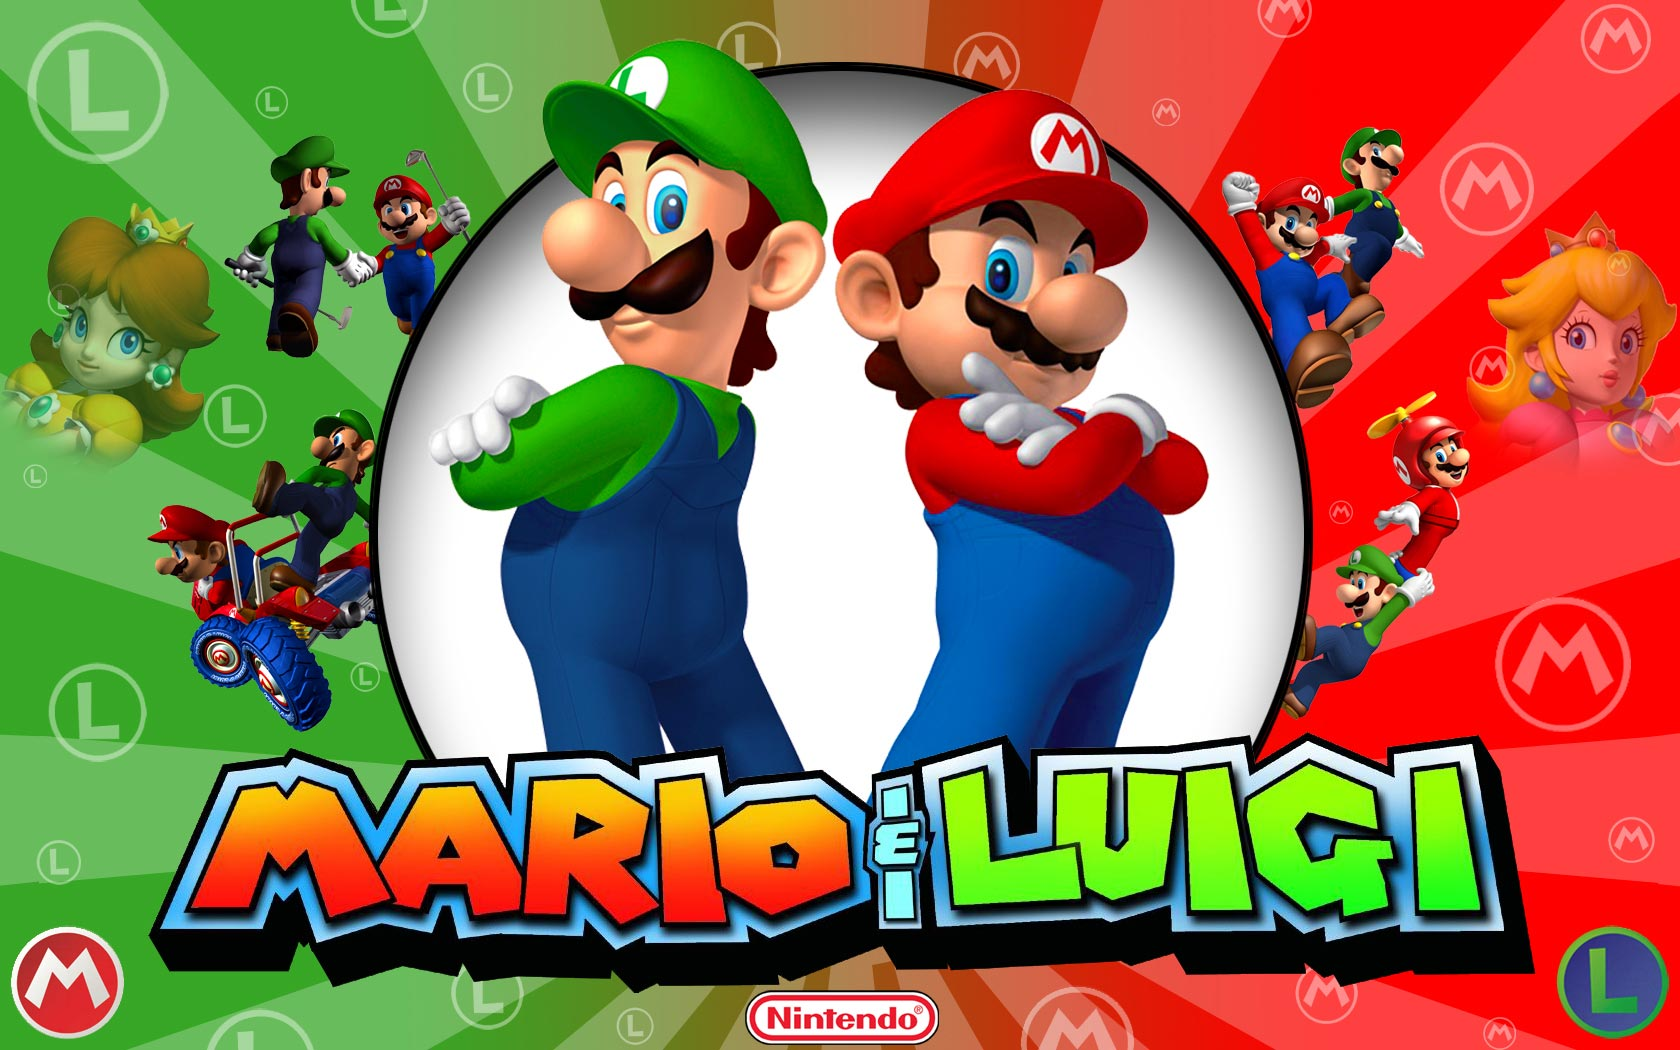 Modojo | Mario & Luigi: Paper Jam Is An Extra-Special Crossover